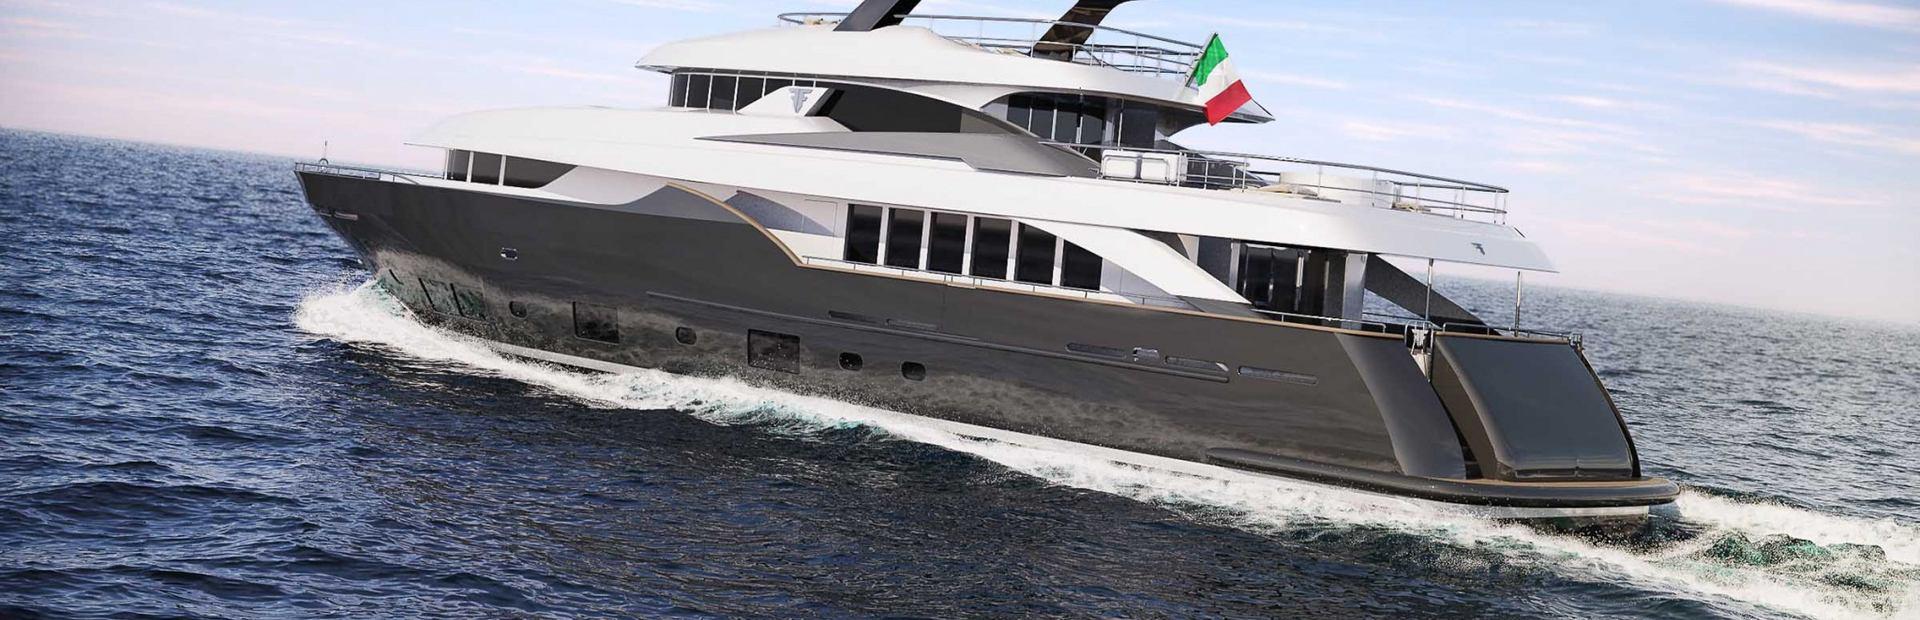 Navetta 35 Yacht Charter